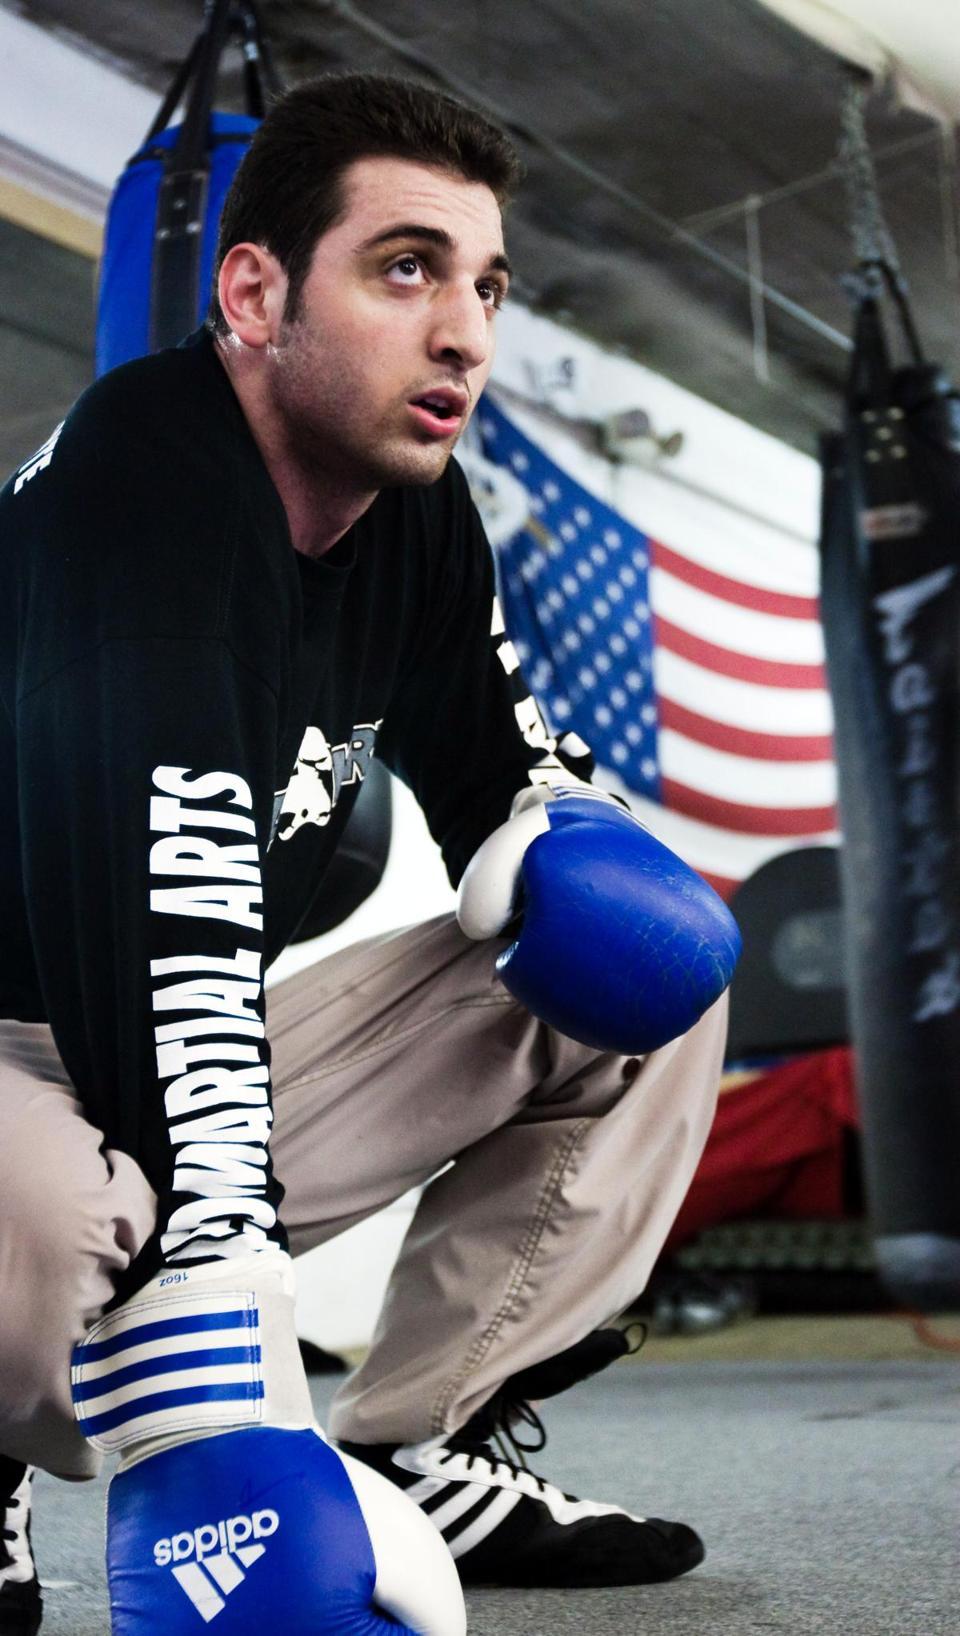 Tamerlan Tsarnaev practiced boxing at the Wai Kru Mixed Martial Arts center in Boston in this April 2009 photo.